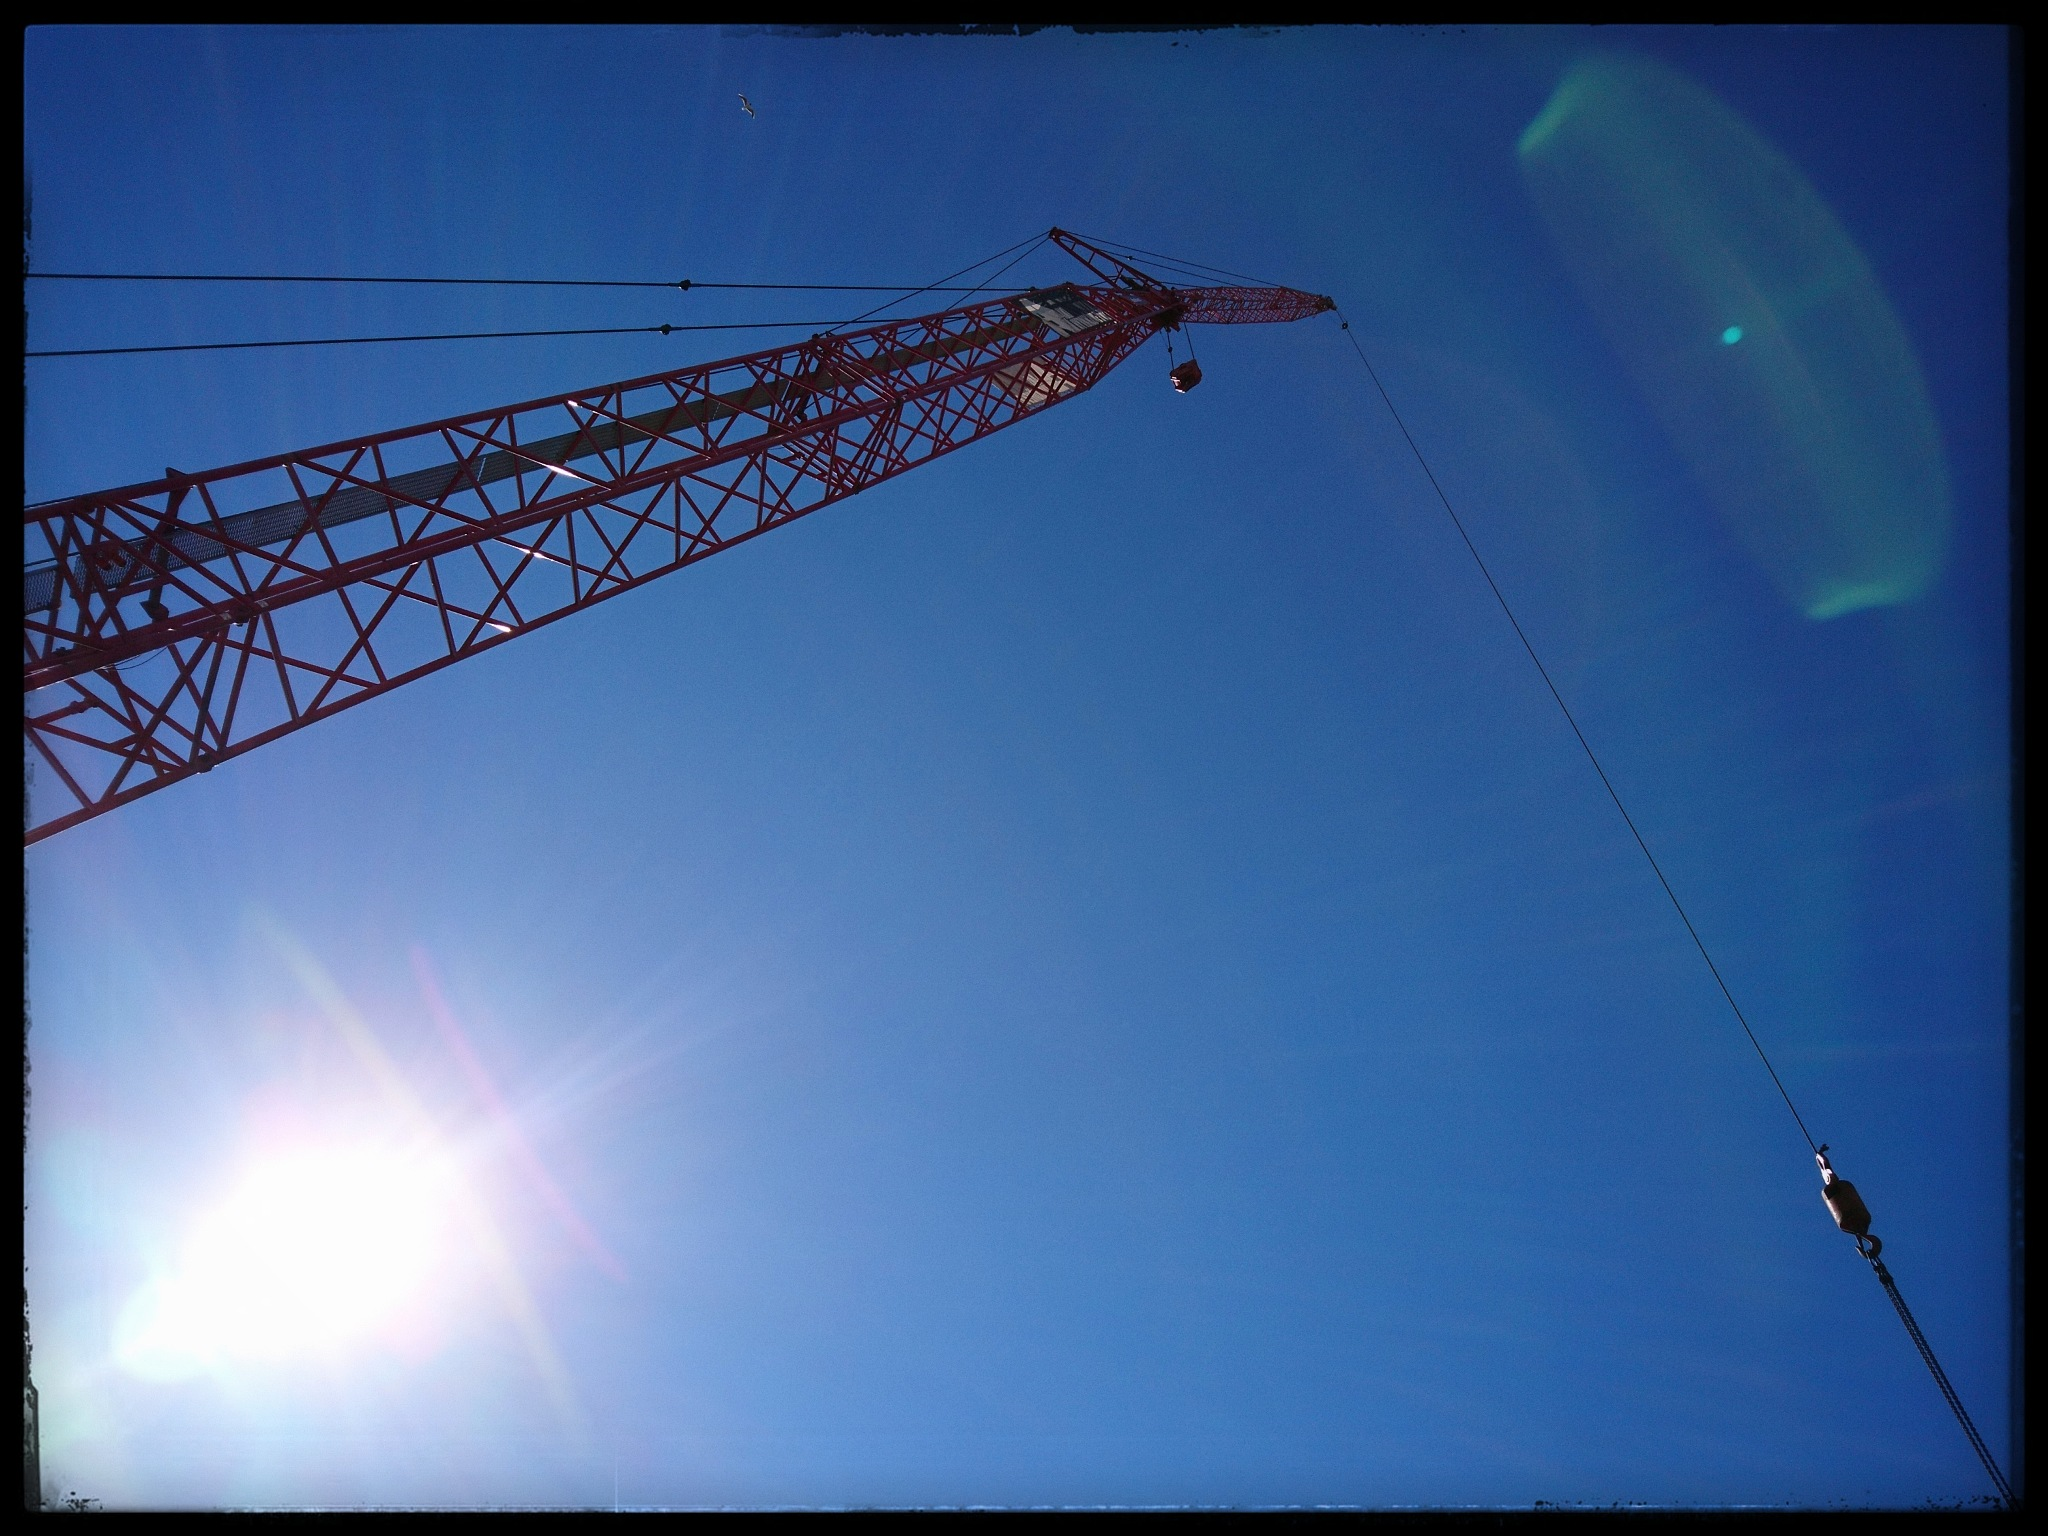 Crane  by Sami Serola